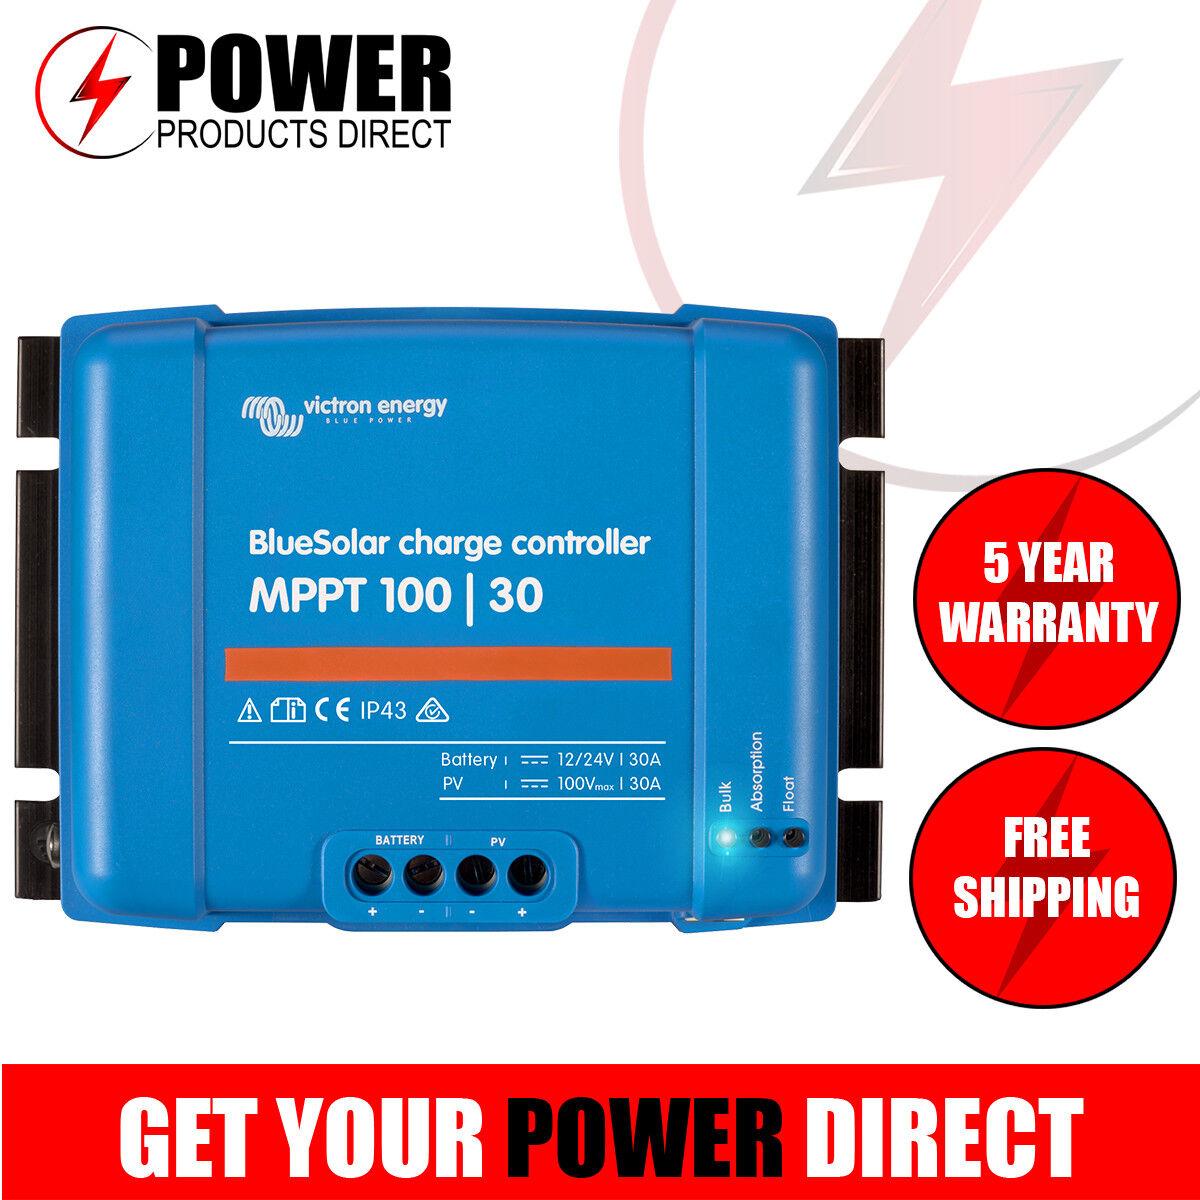 Victron Energy 100 30 Mppt Solar Controller 12v 24v 100v Input Battery Charger Circuit Besides Charge 30a